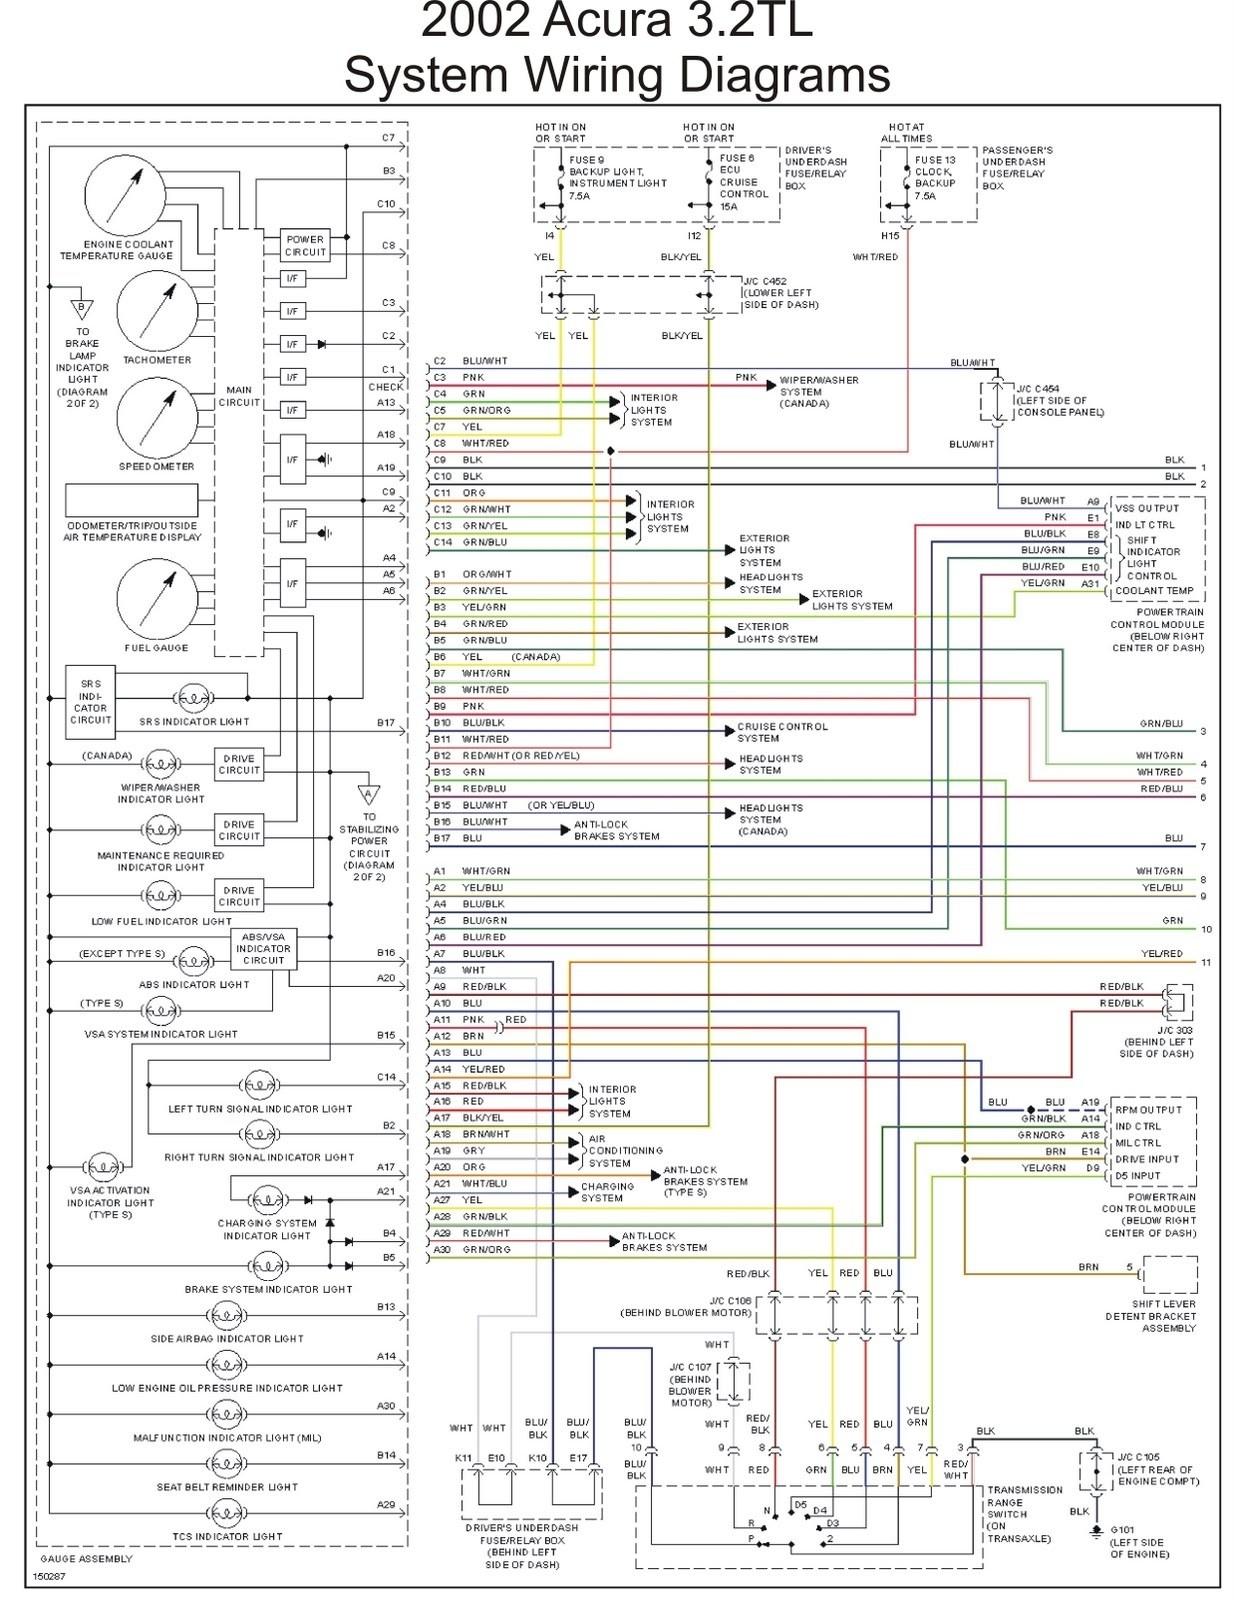 02 saturn sc1 fuse box 2000 saturn wiring diagram e1 wiring diagram  2000 saturn wiring diagram e1 wiring